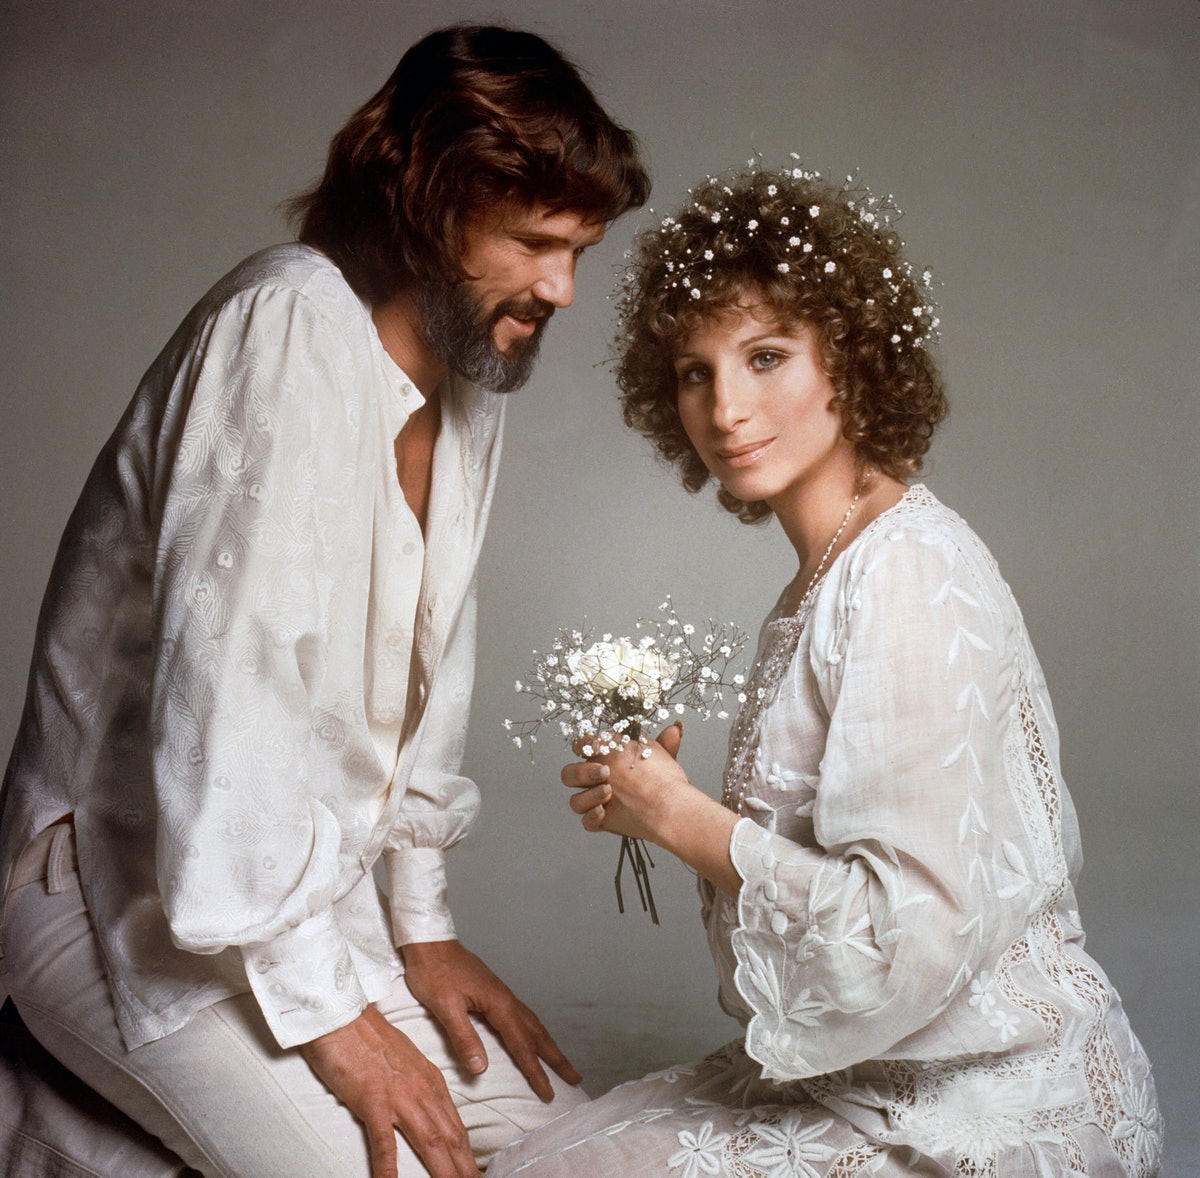 Barbara Streisand  and Kris Kristofferson in 'A Star Is Born'